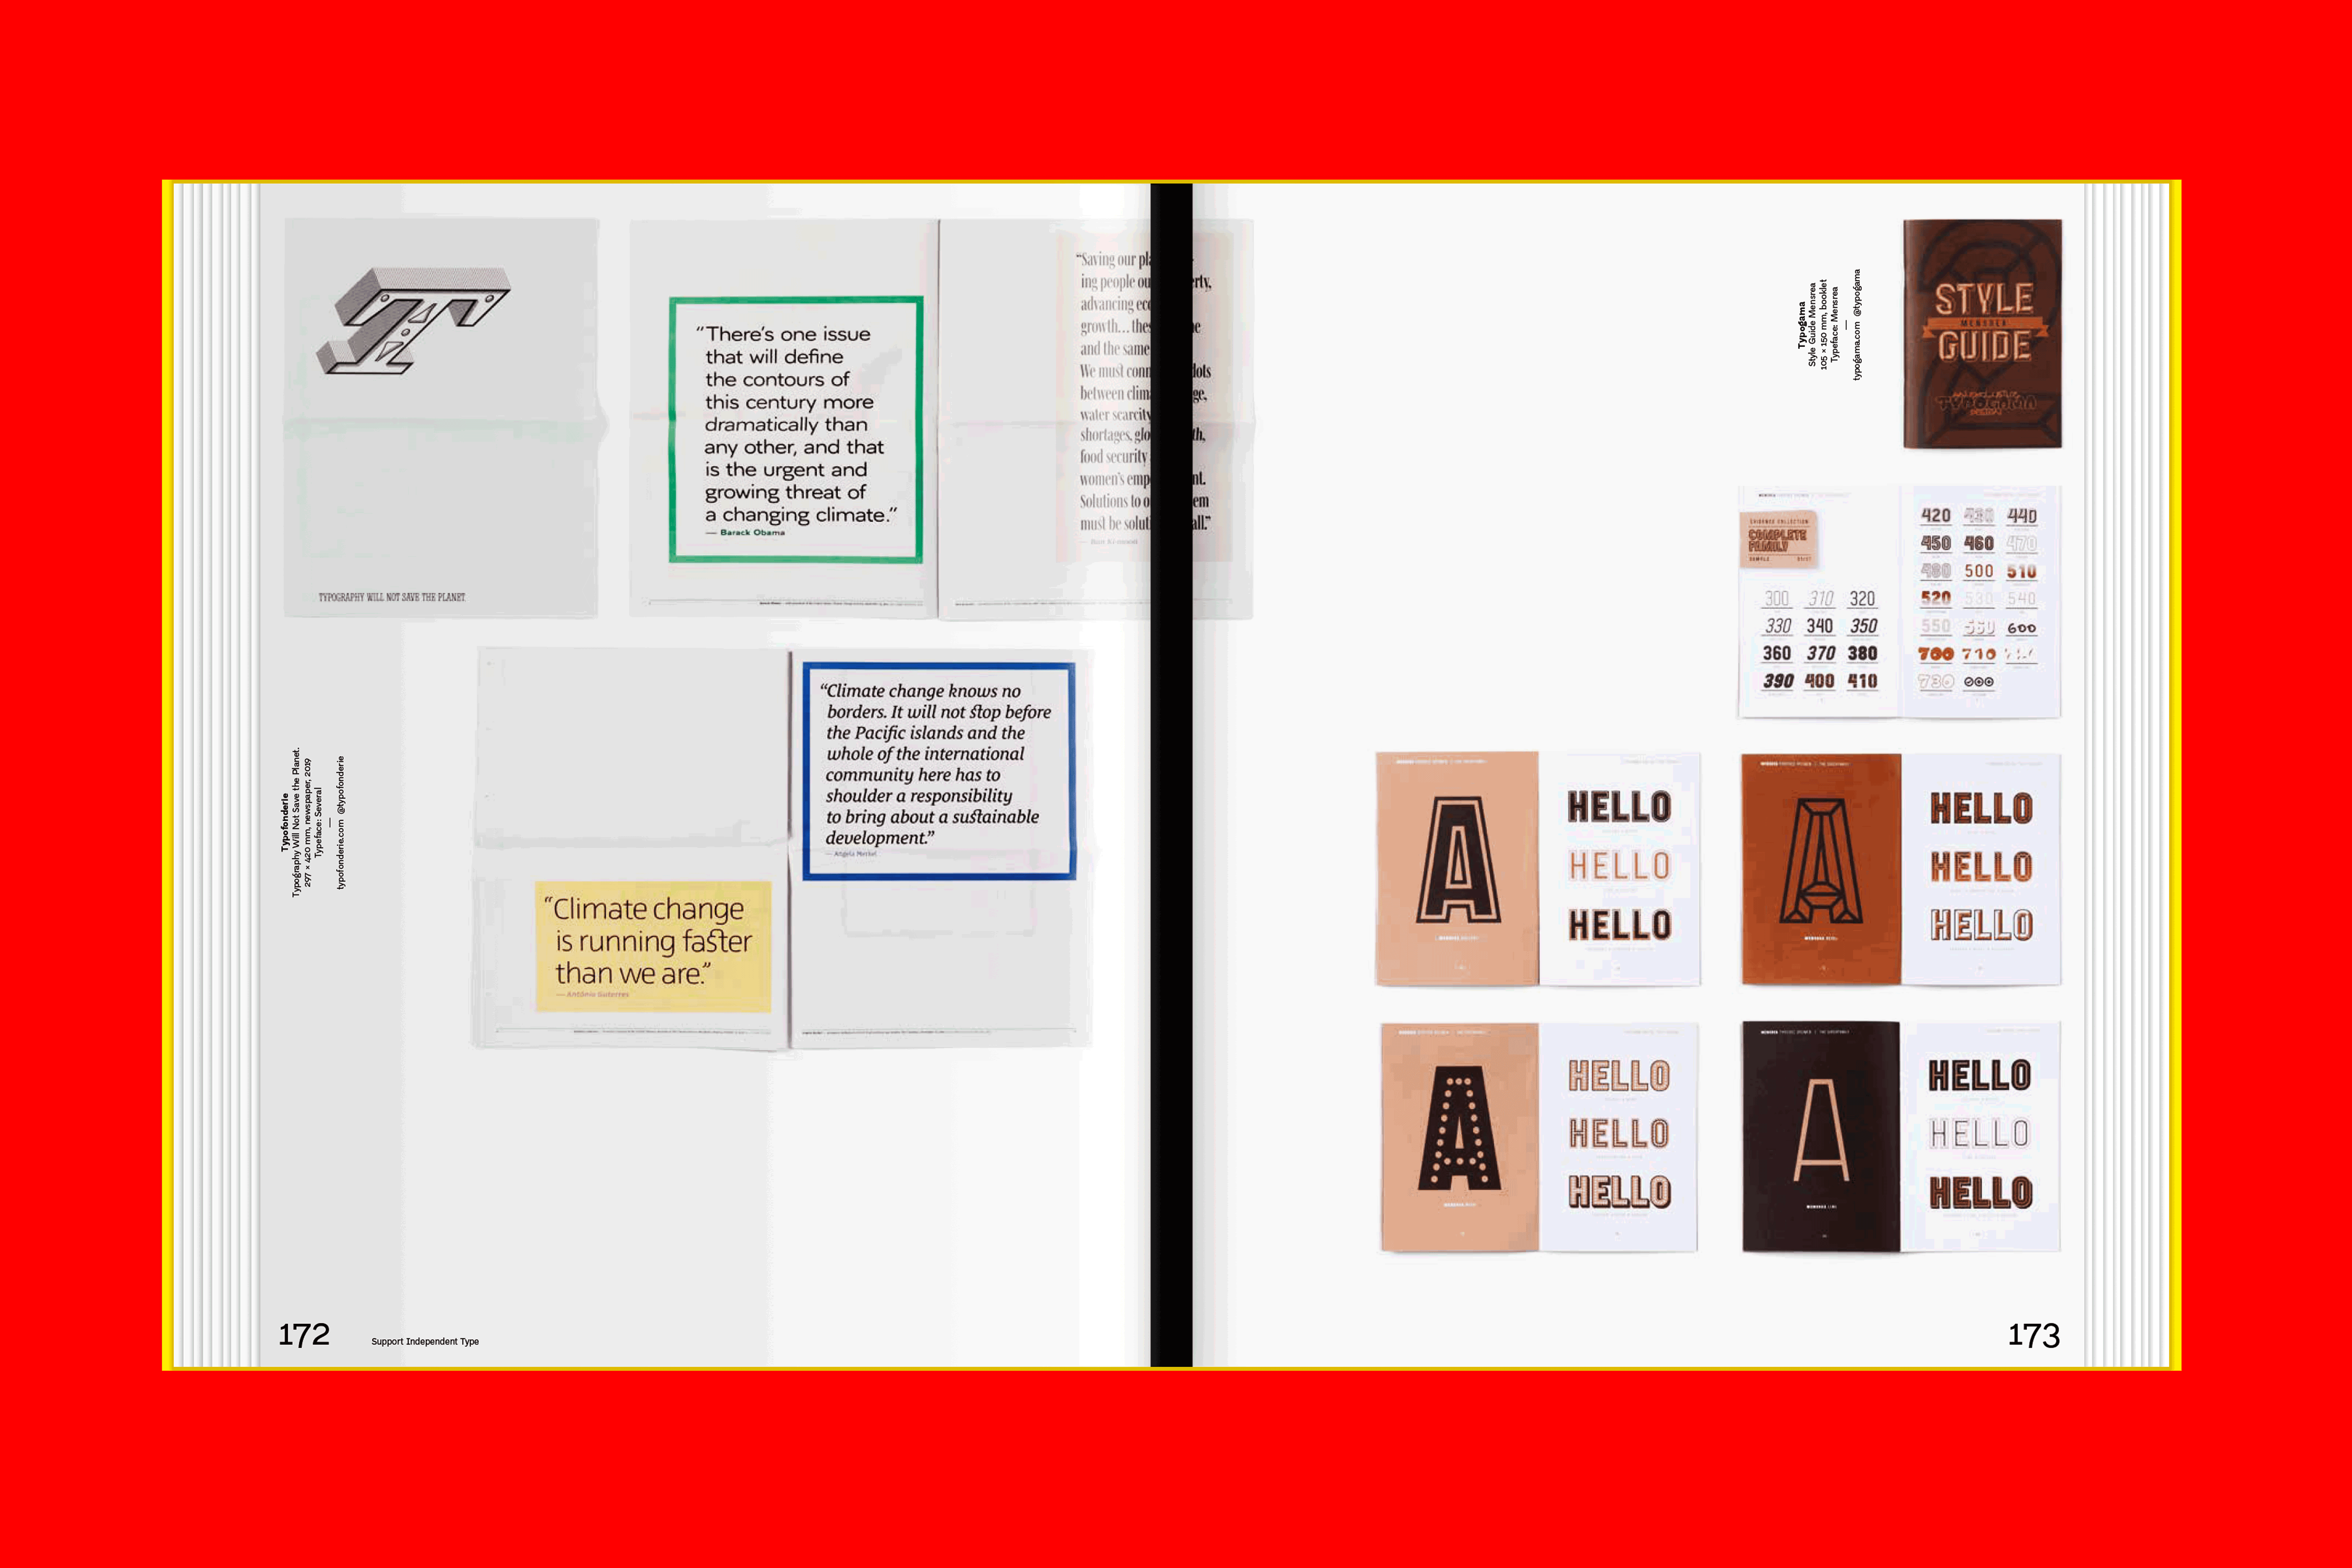 Slanted-Publiaktionen-Slanted-Publishers-Support-Independent-Type_21